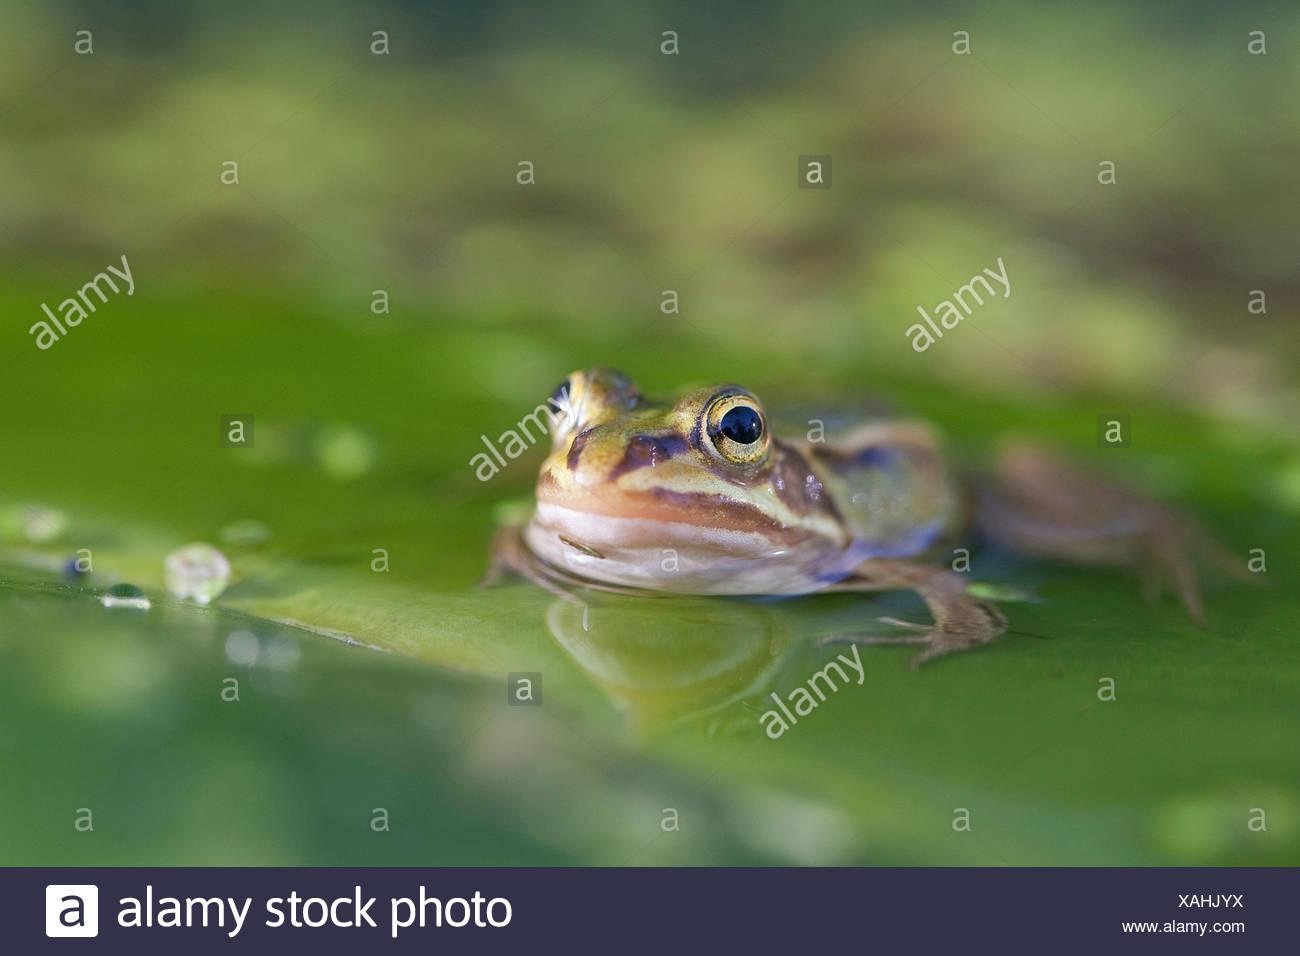 European edible frog, common edible frog (Rana kl. esculenta, Rana esculenta, Pelophylax esculentus), swimming, Germany - Stock Image